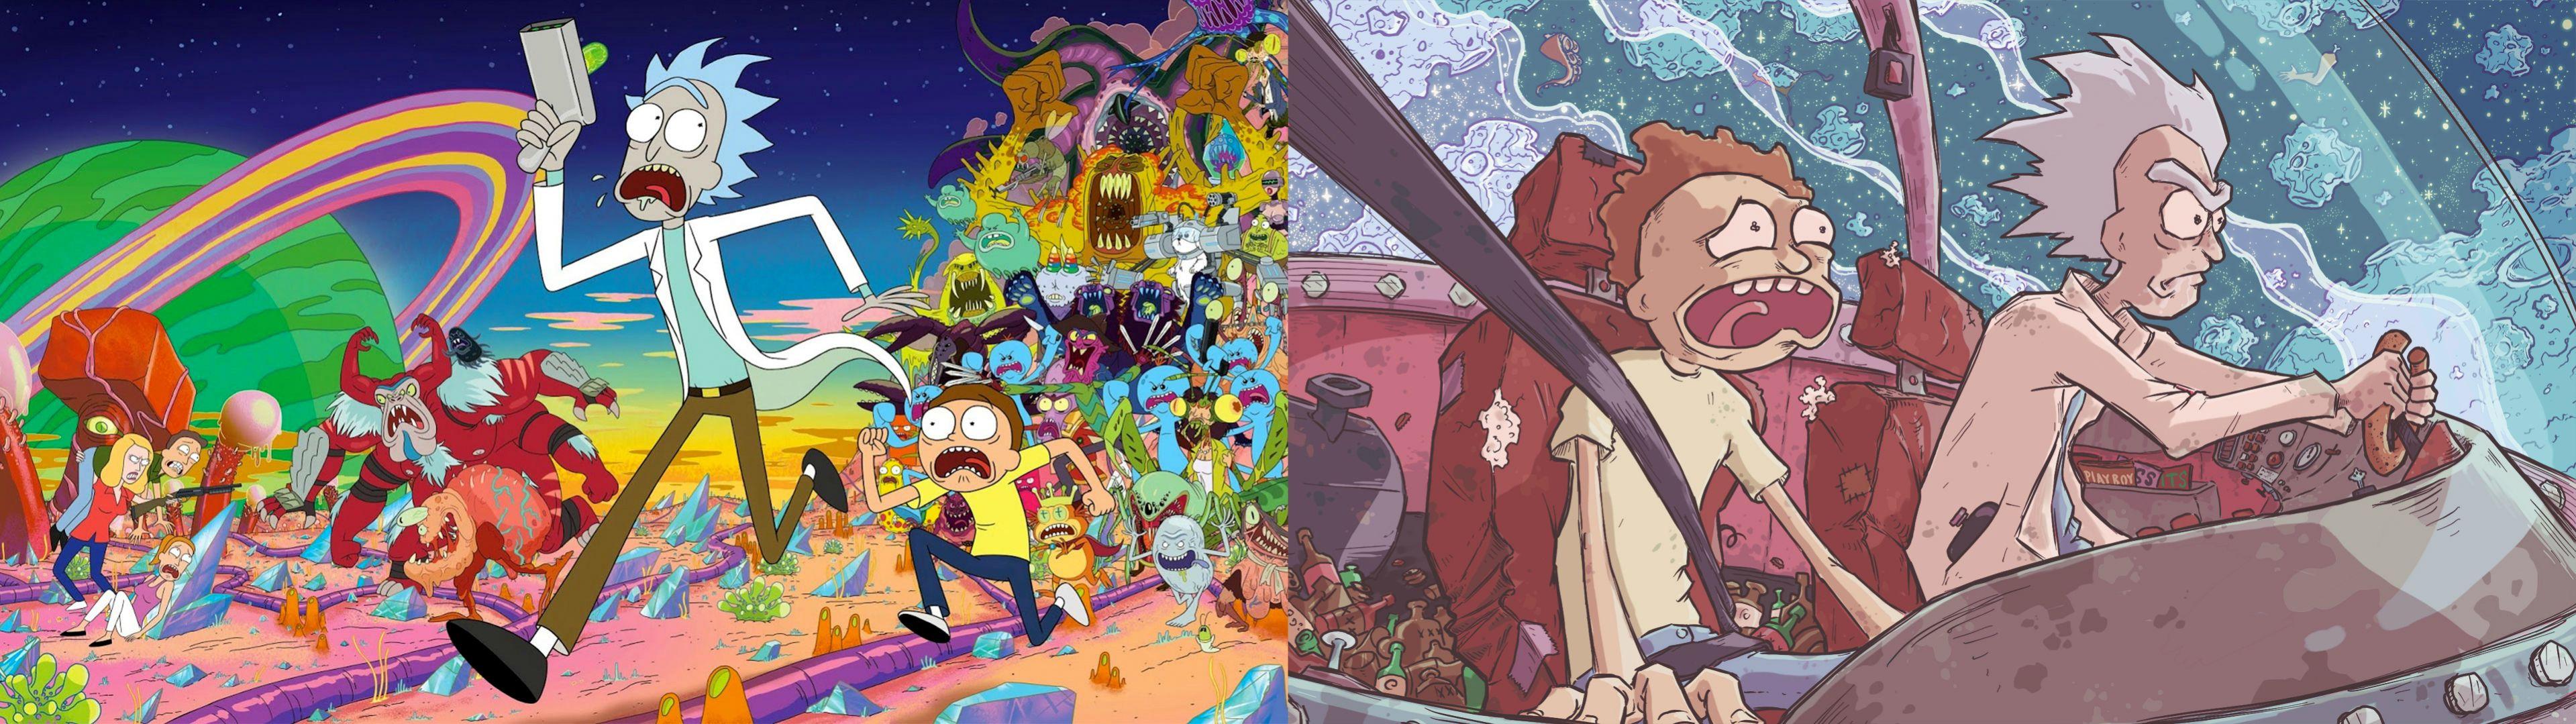 Rick And Morty Dual Screen Wallpaper